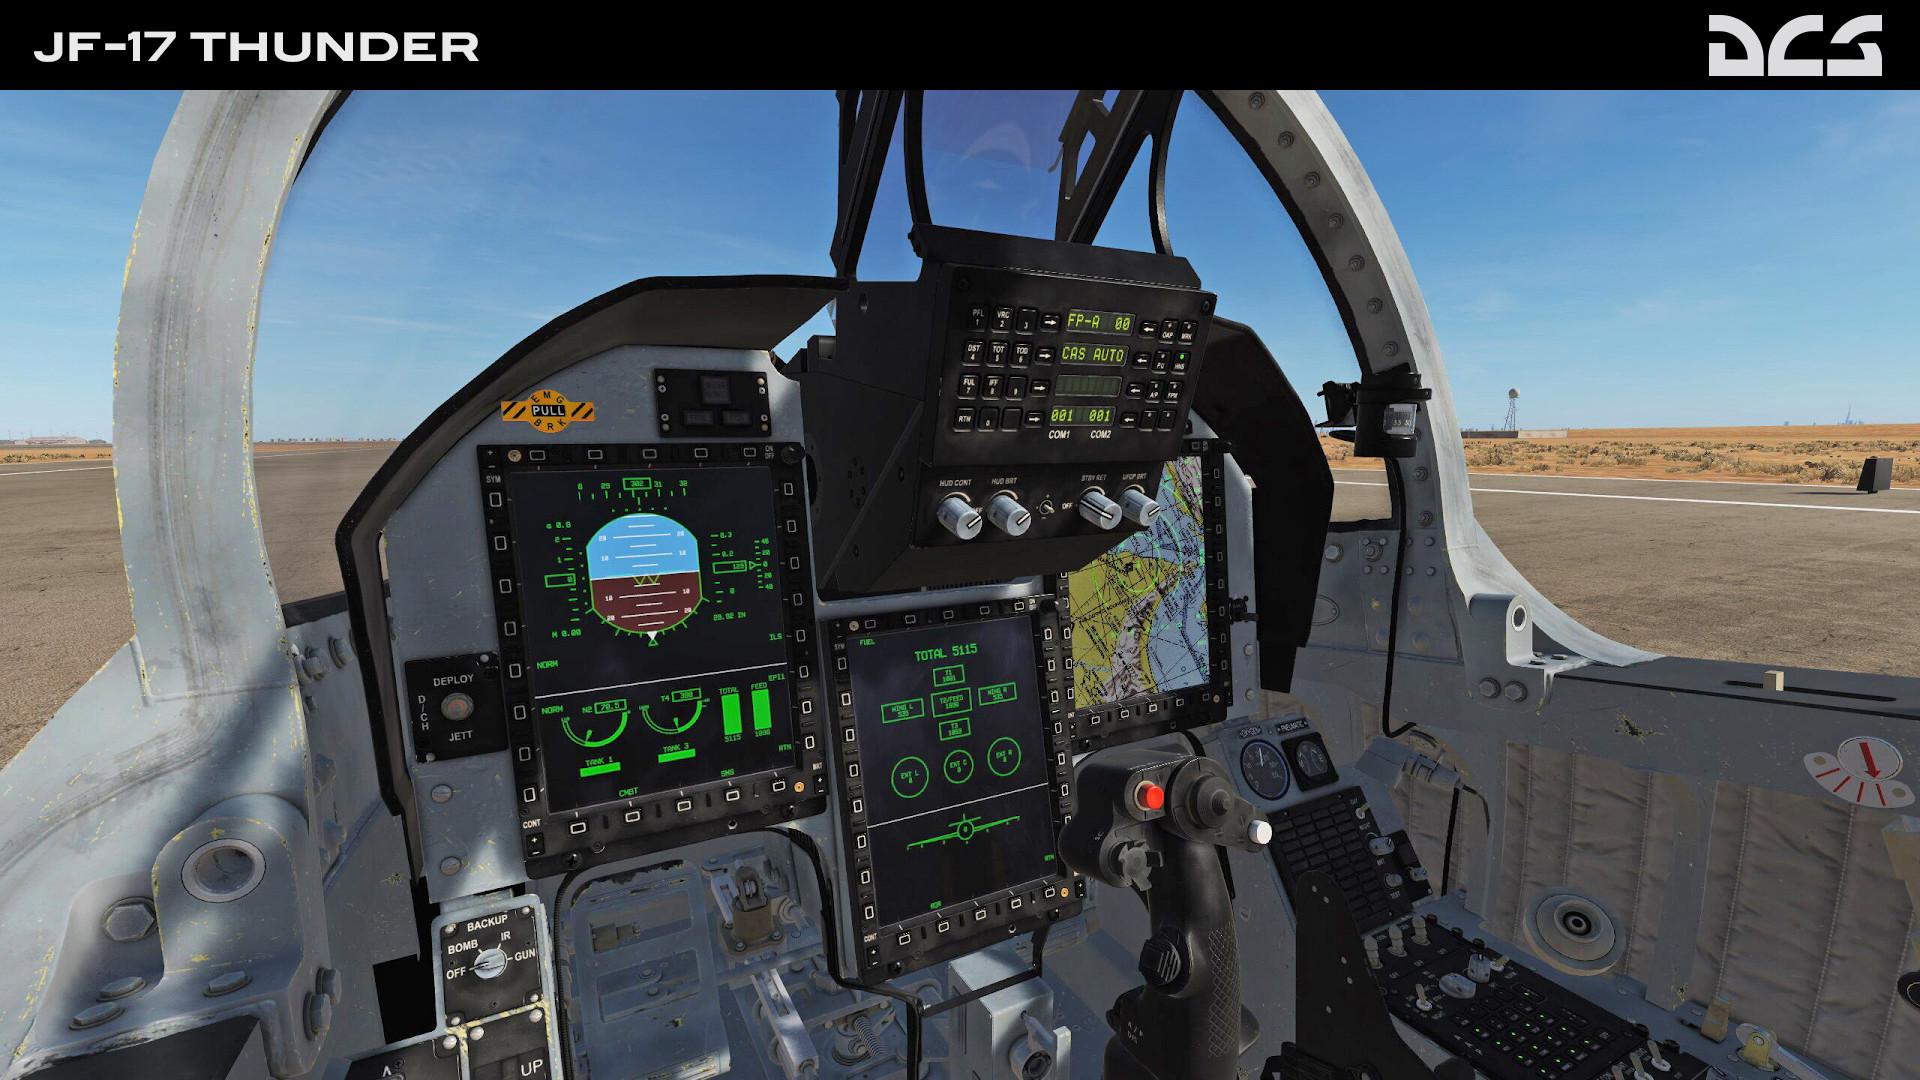 DCS: JF-17 Thunder Fiyat Karşılaştırma